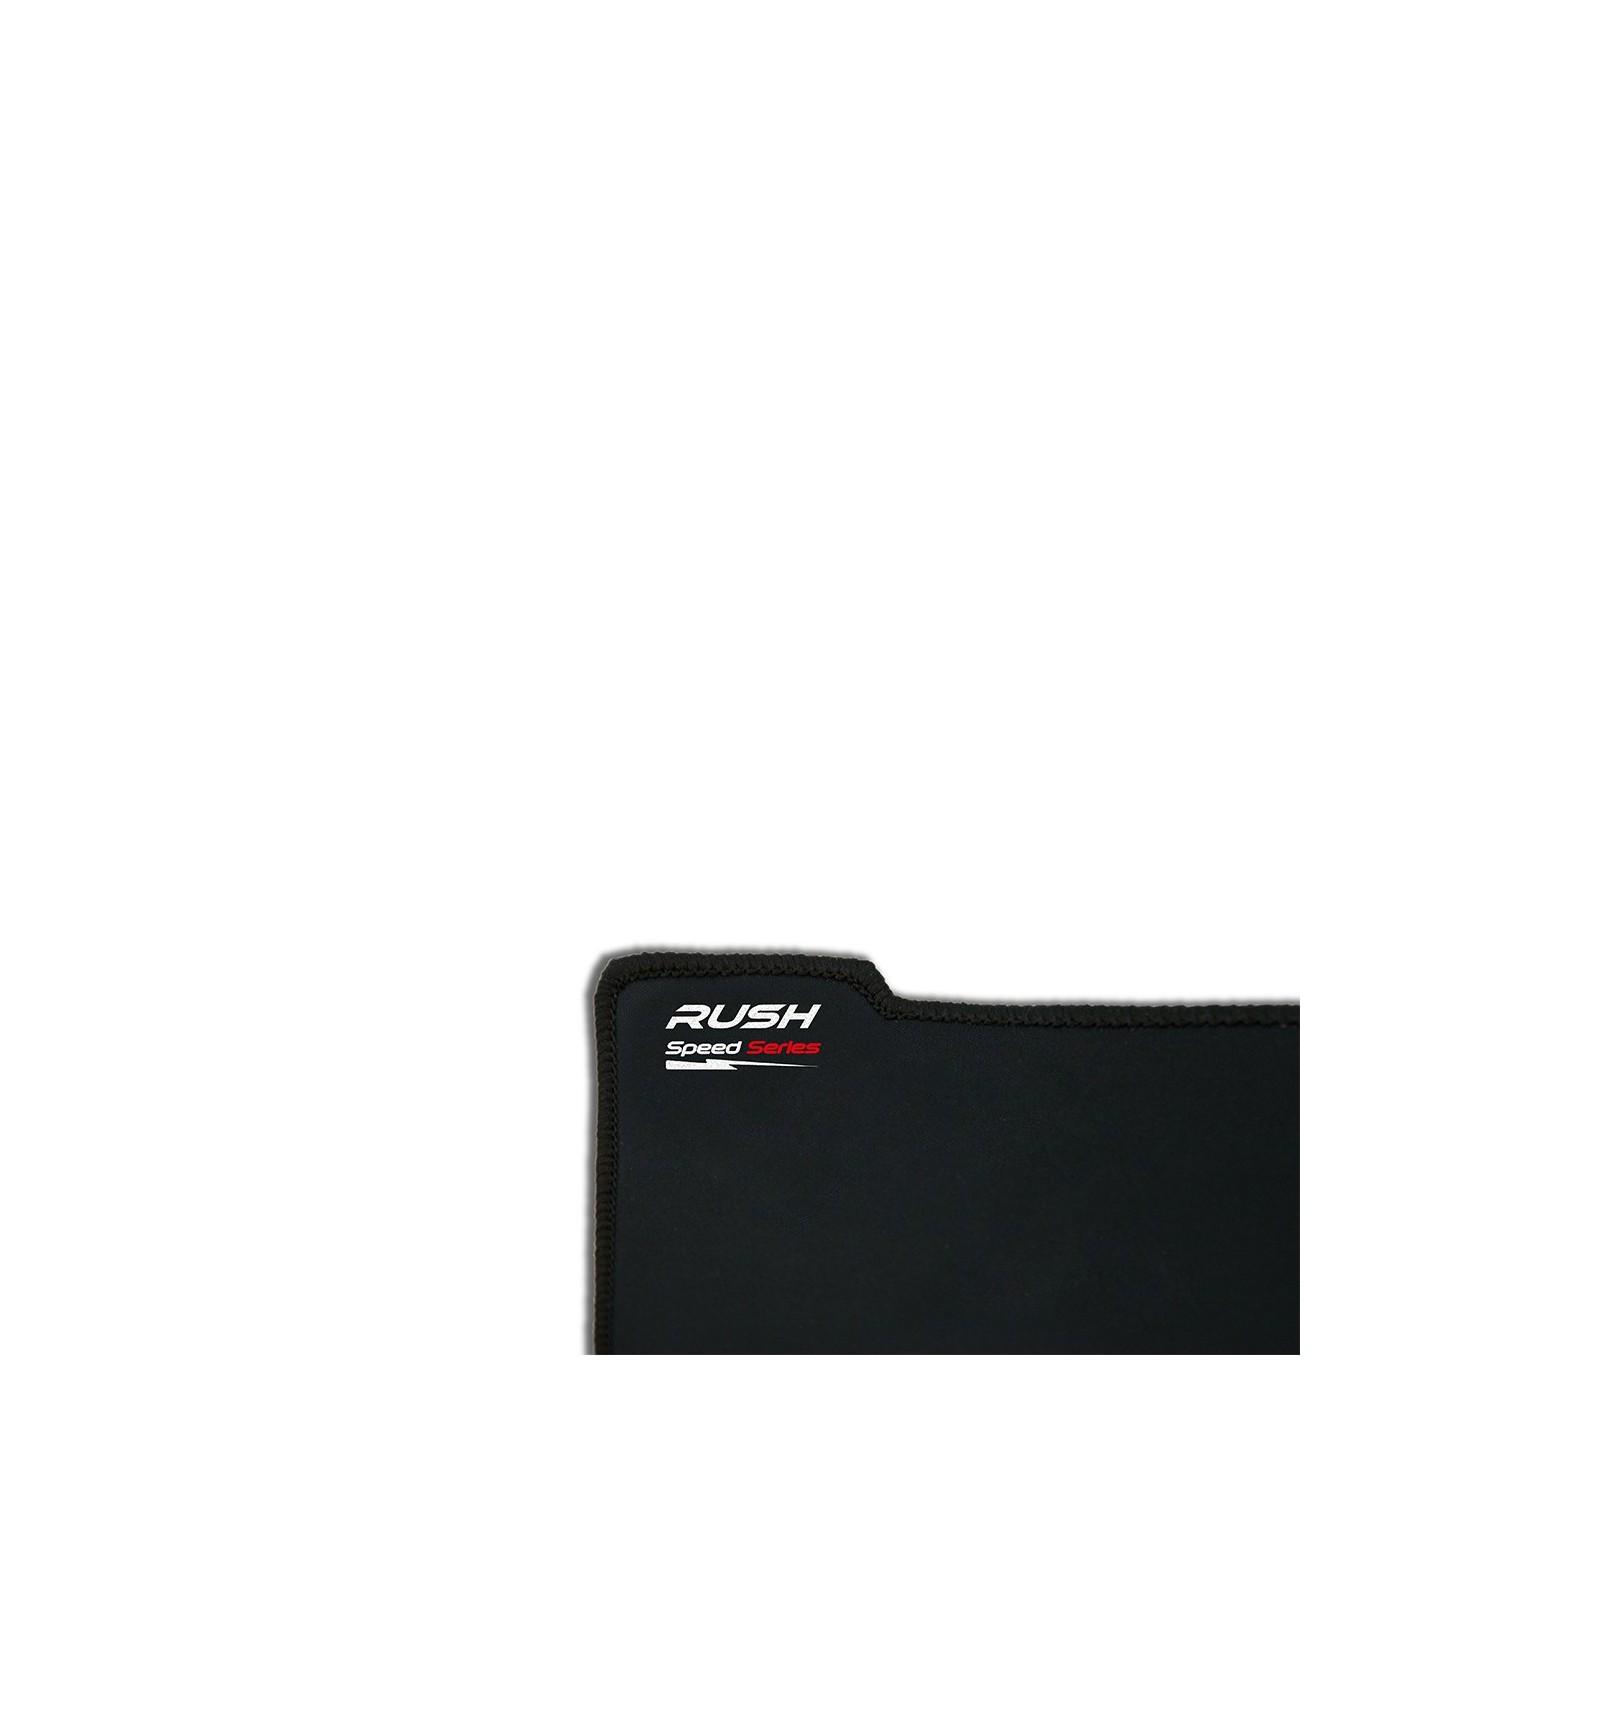 Elekele WiFi Adaptador Inal/ámbrico USB 600/Mbit//s Dual Band Mini Wireless Receptor para Windows 10//8.1//8//7//XP//Vista//Mac OS//Linux 2.6 X000R43VVR 2.4G//150Mbps + 5G//433mbps